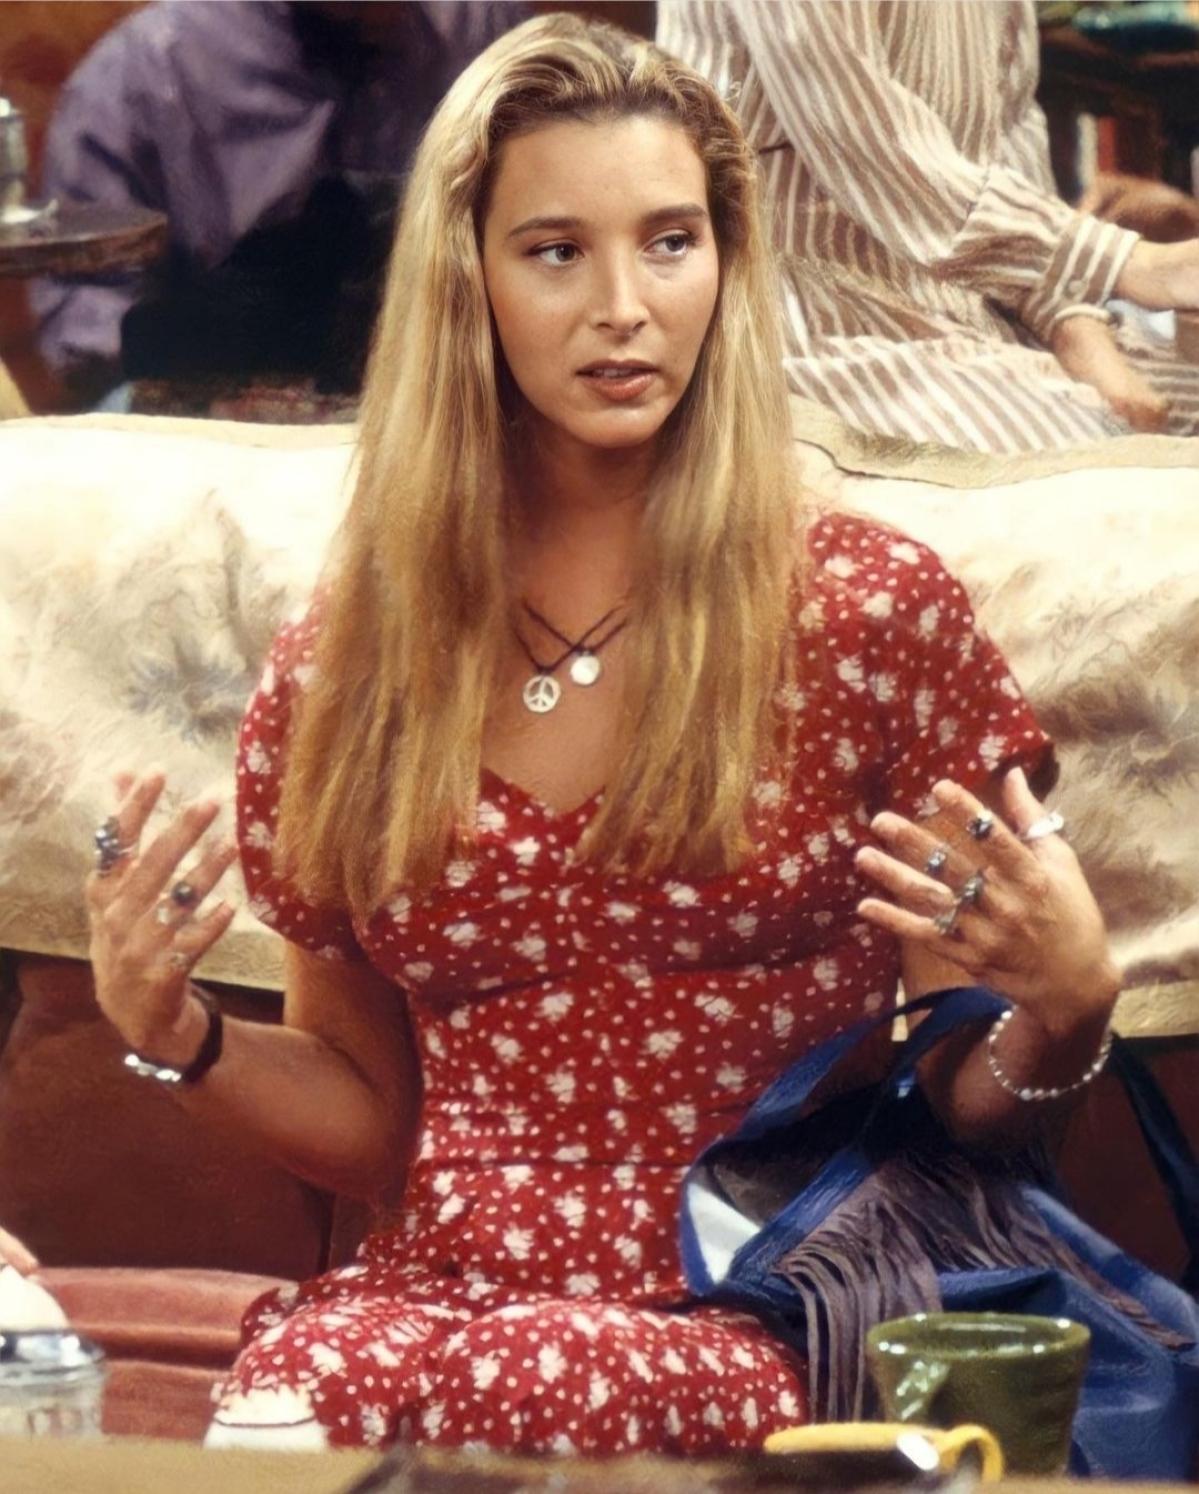 Phoebe played by Lisa Kudrow